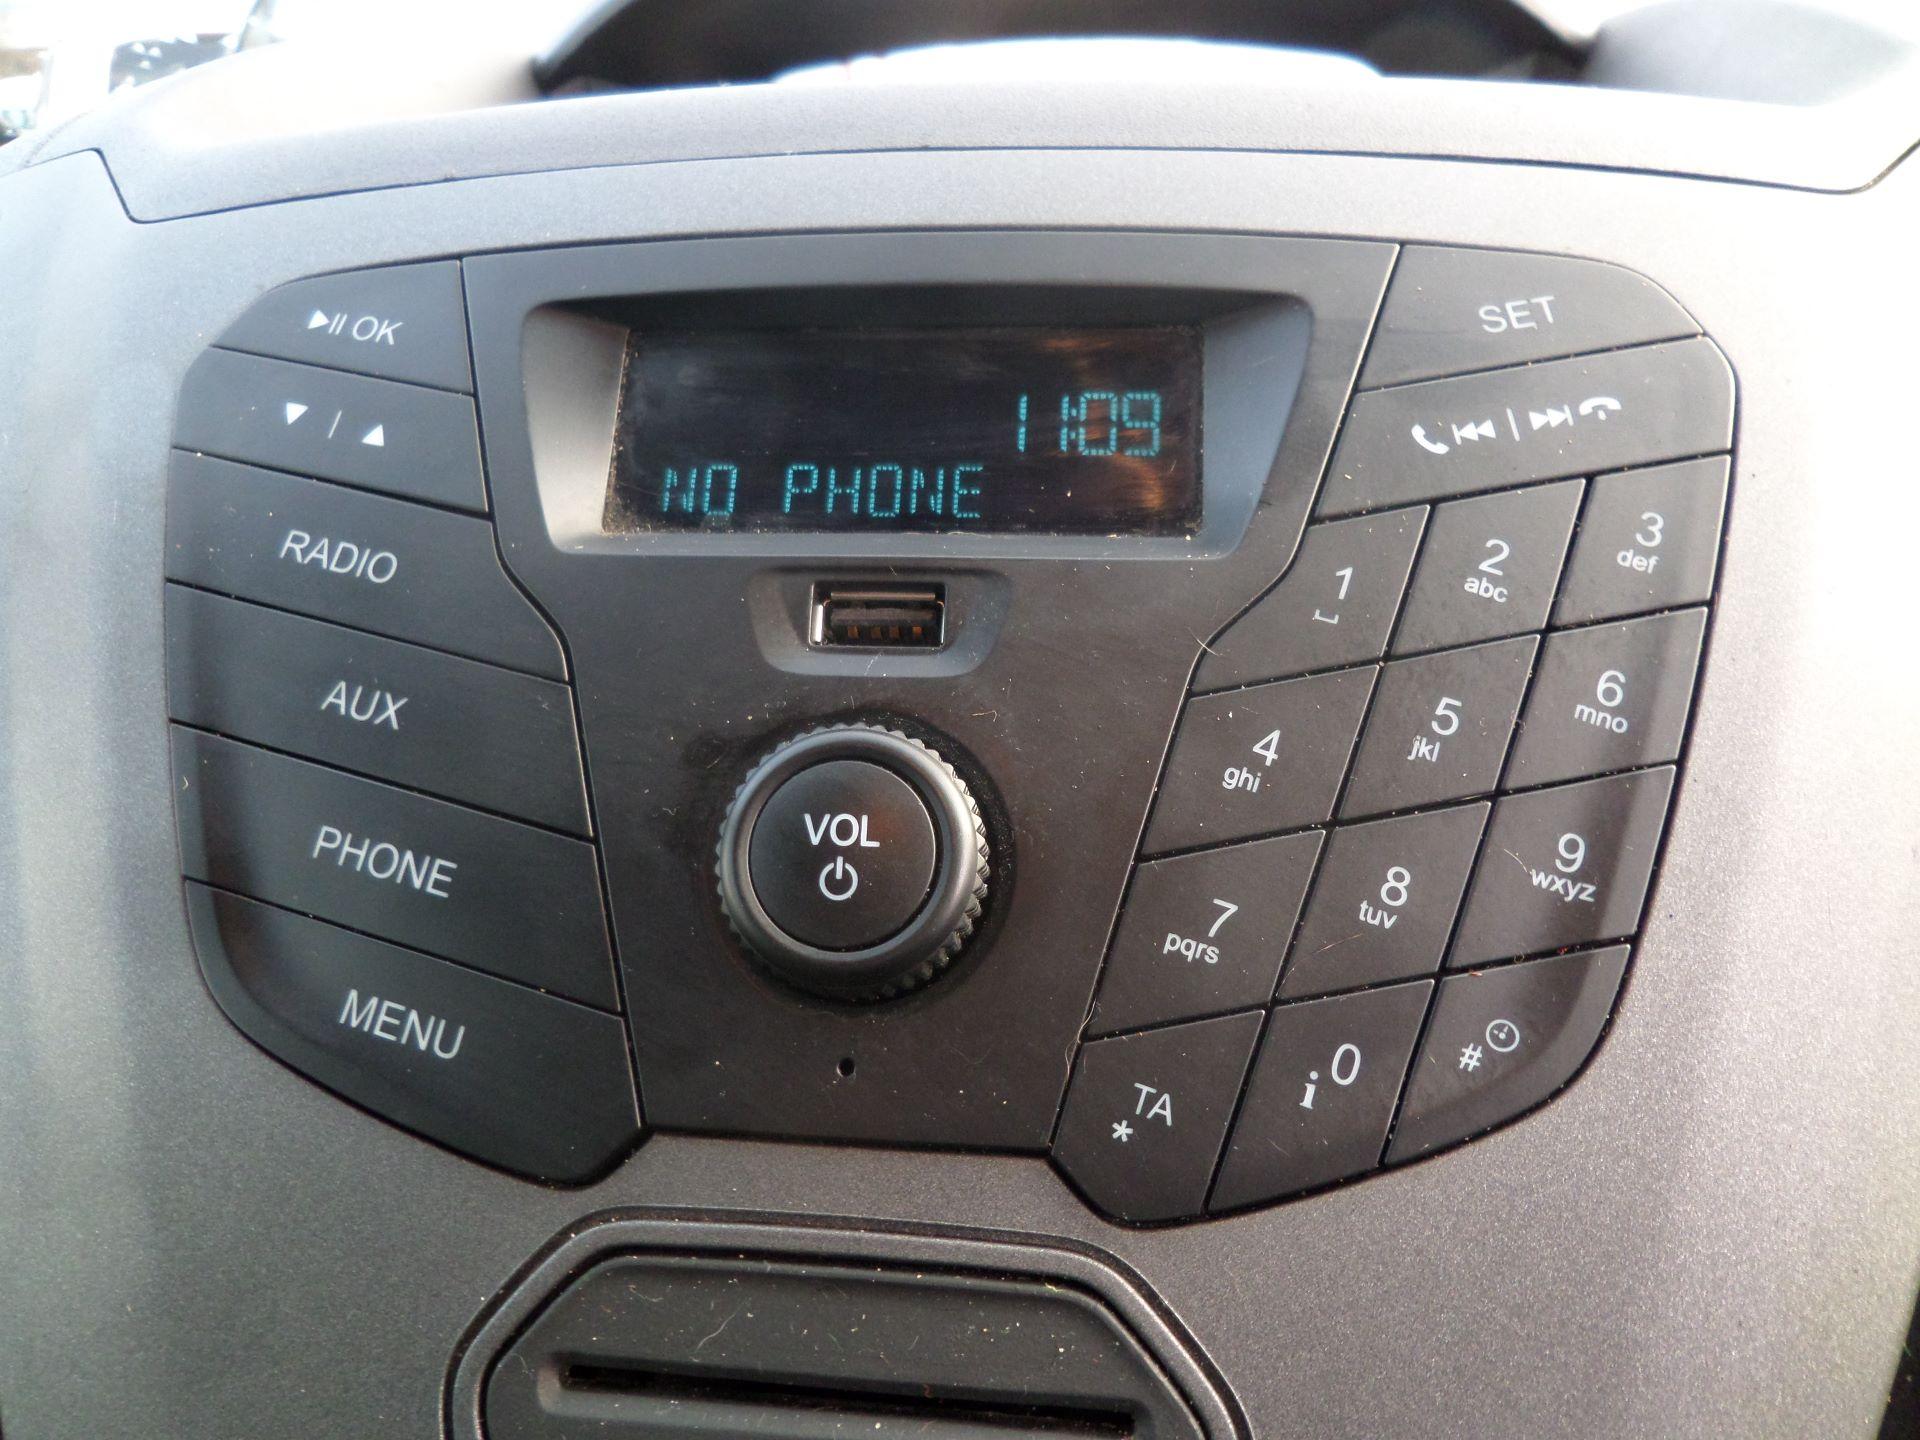 2018 Ford Transit 2.0 Tdci 130Ps Dropside Euro 6 (BK18JUT) Image 11